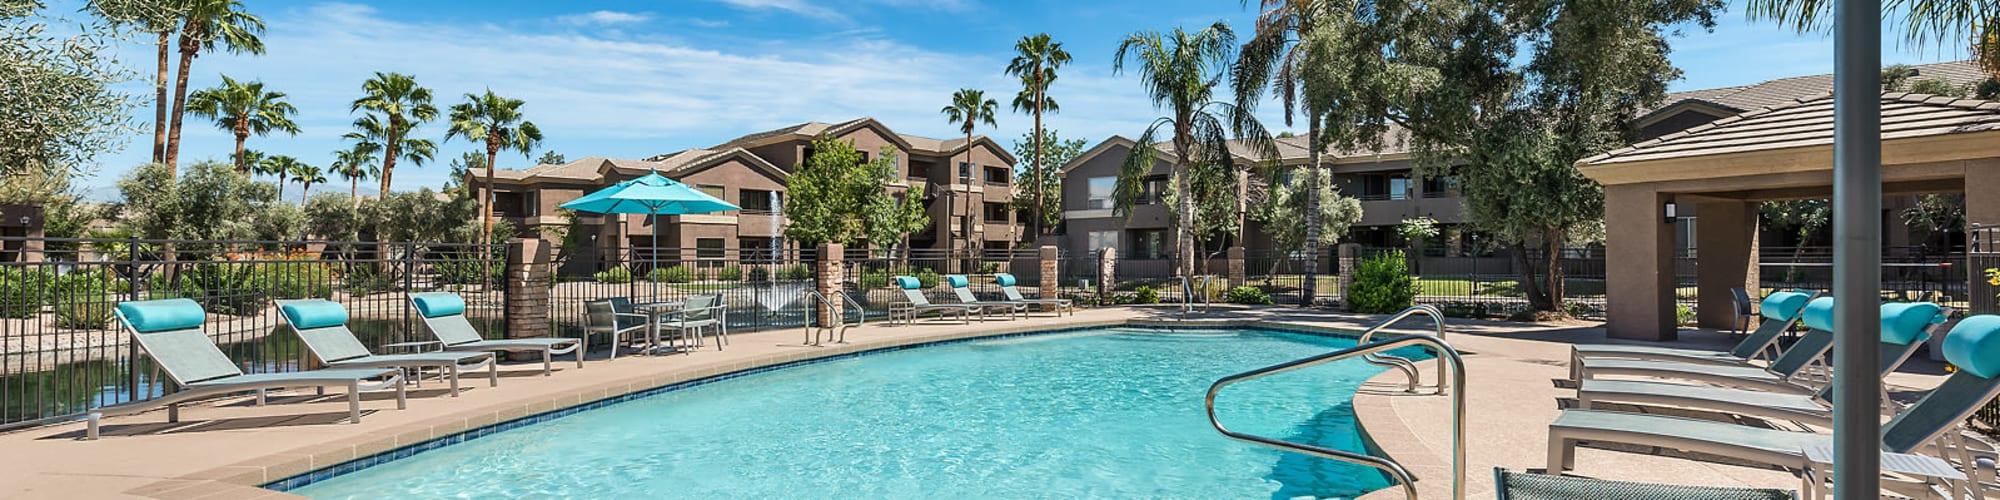 Map & Directions to Laguna at Arrowhead Ranch in Glendale, Arizona